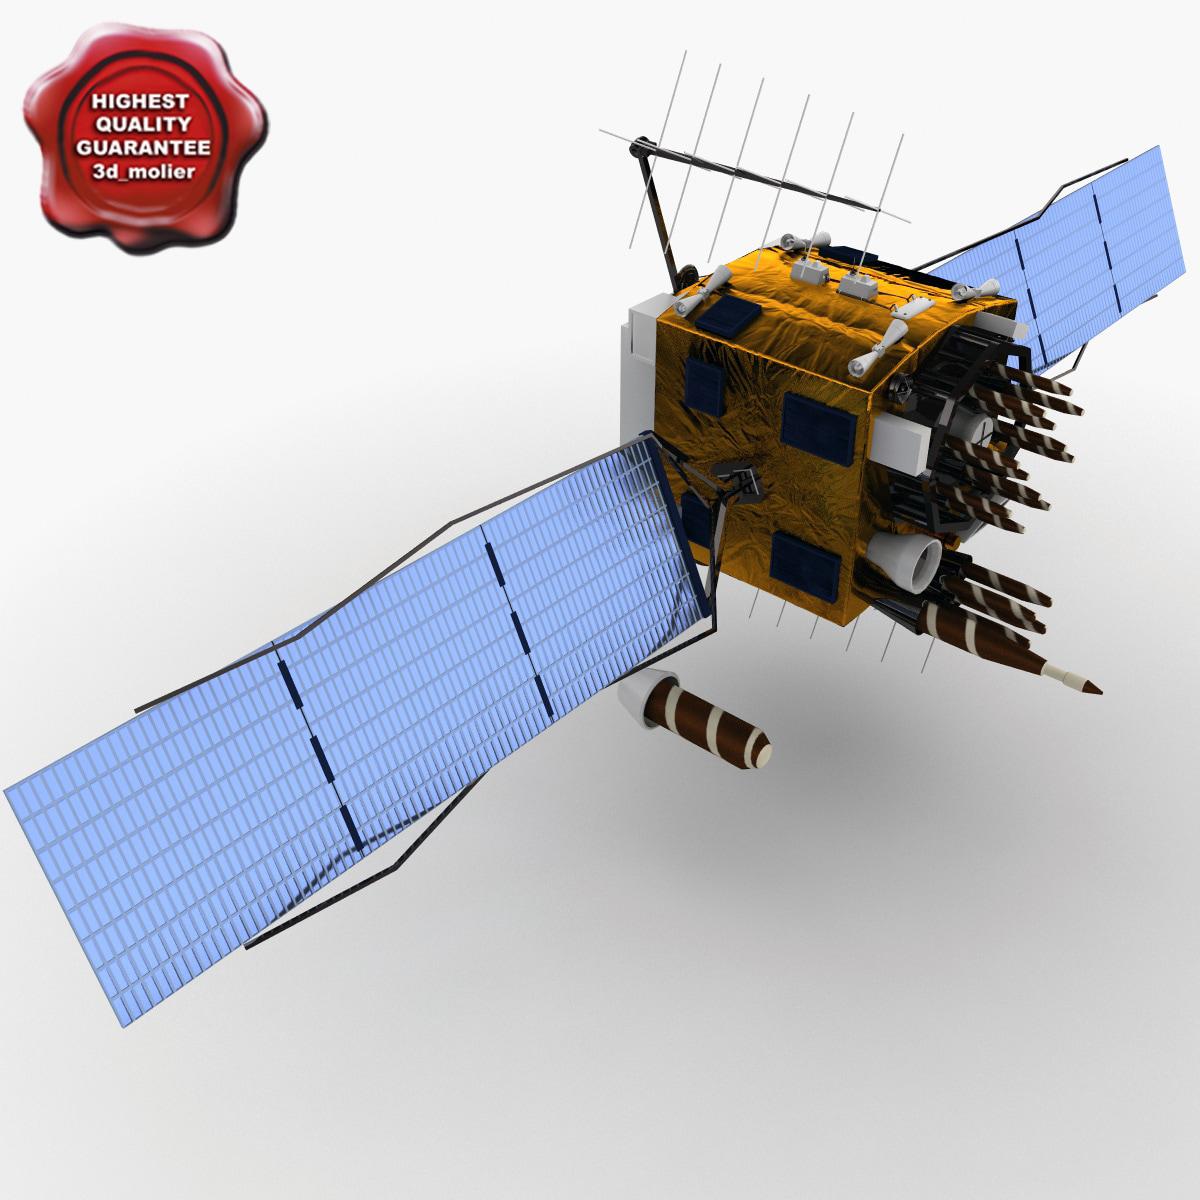 GPS_Satellite_Navstar_54_USA_00.jpg